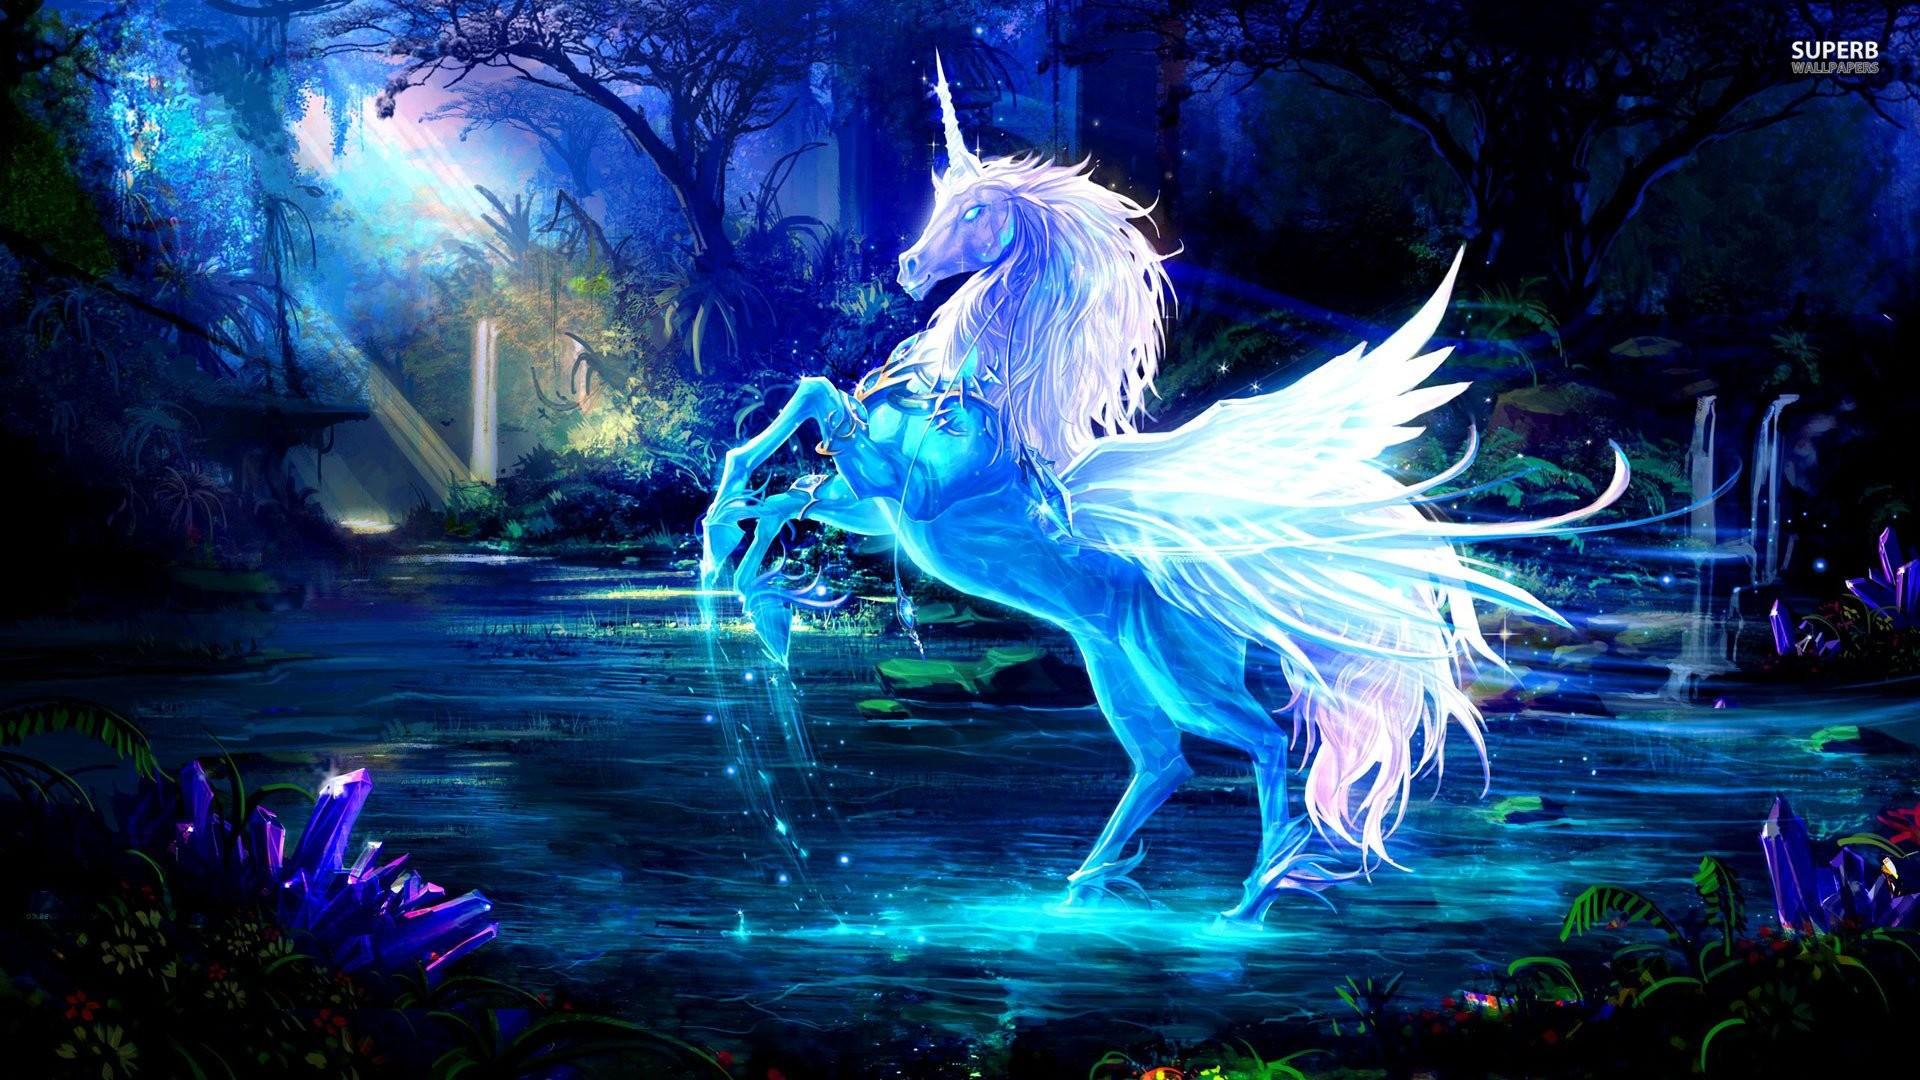 Wonderful   Wallpaper Horse Unicorn - 736219-new-fantasy-unicorn-wallpaper-1920x1080-for-meizu  Perfect Image Reference_869573.jpg